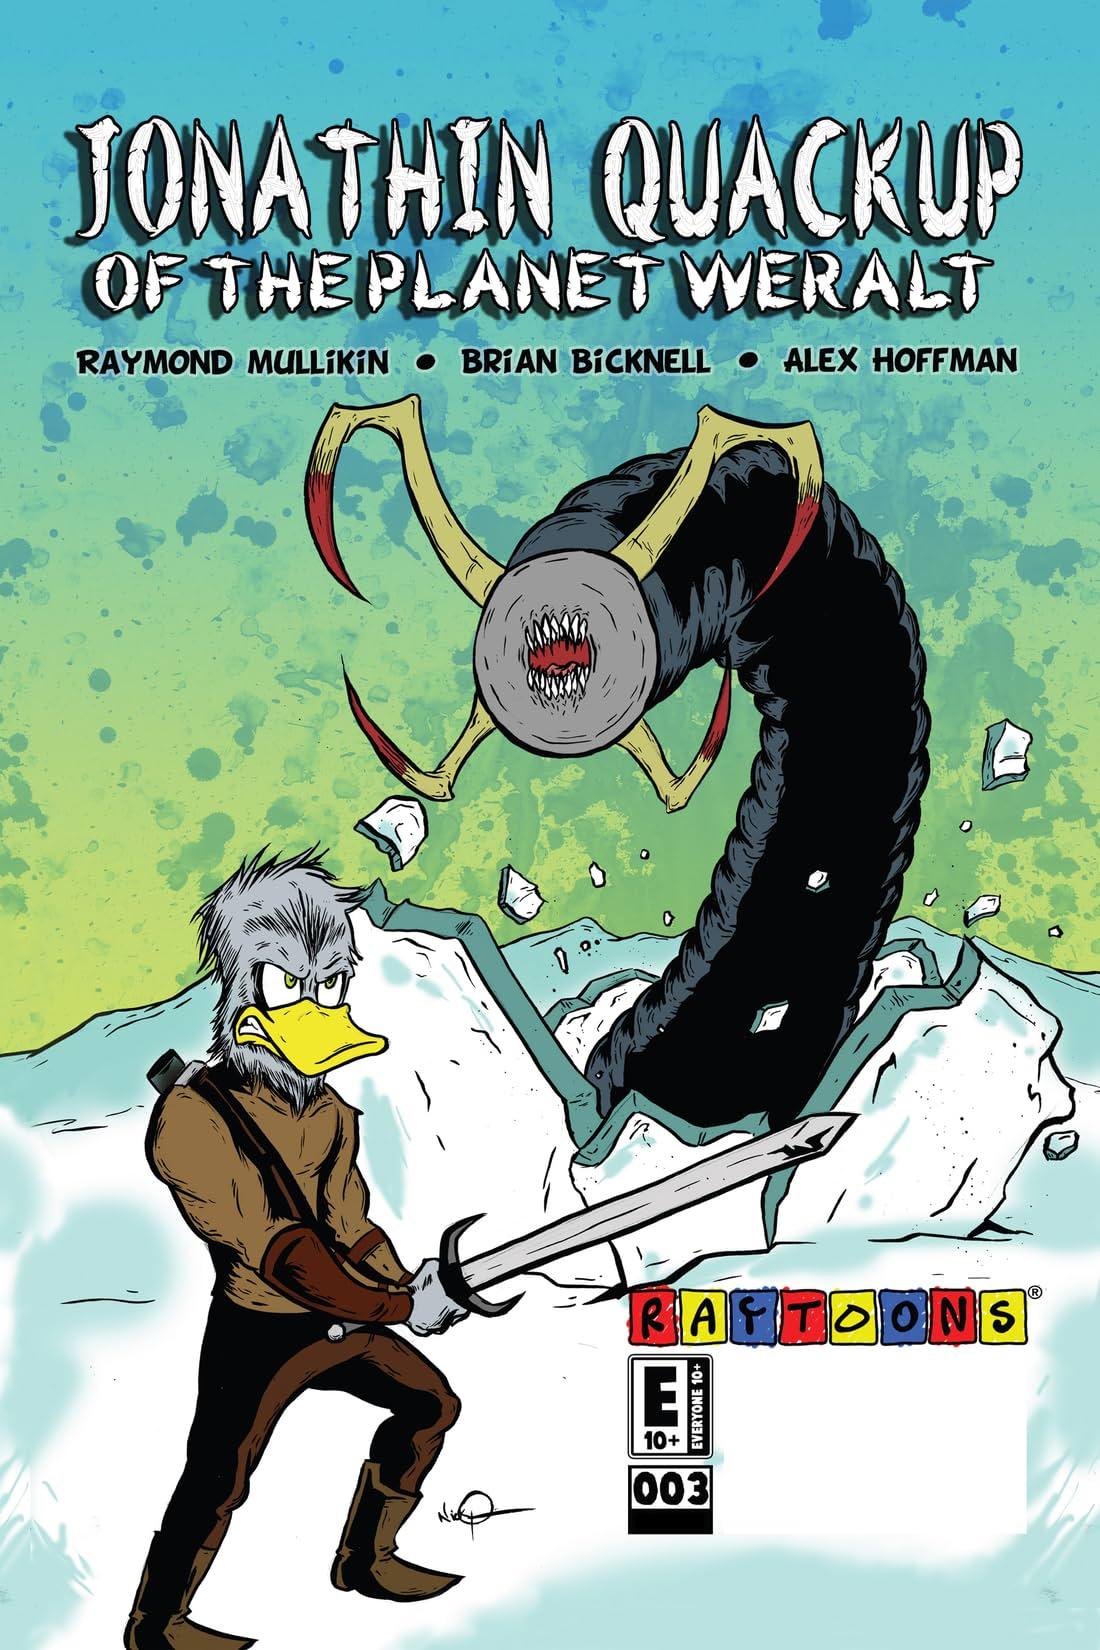 Jonathin Quackup of the Planet Weralt #3